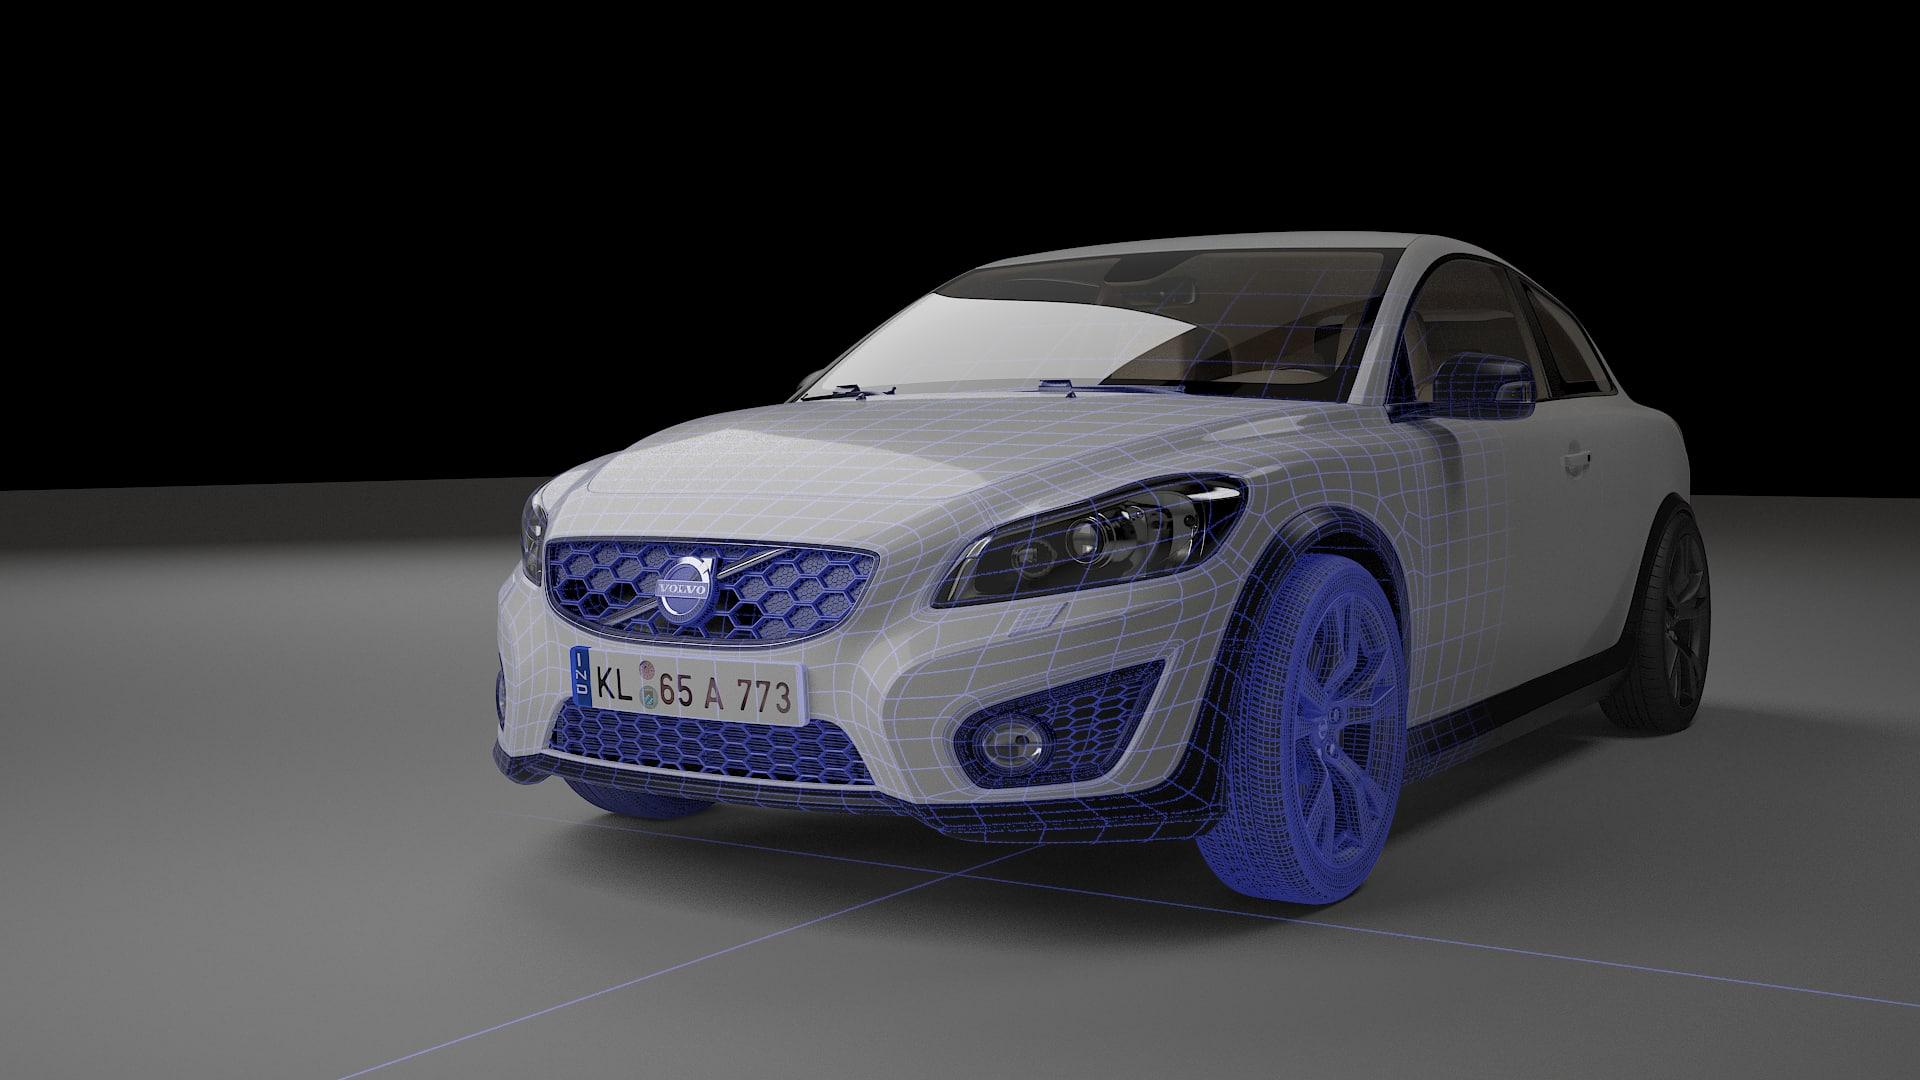 3D bev hq render ready model